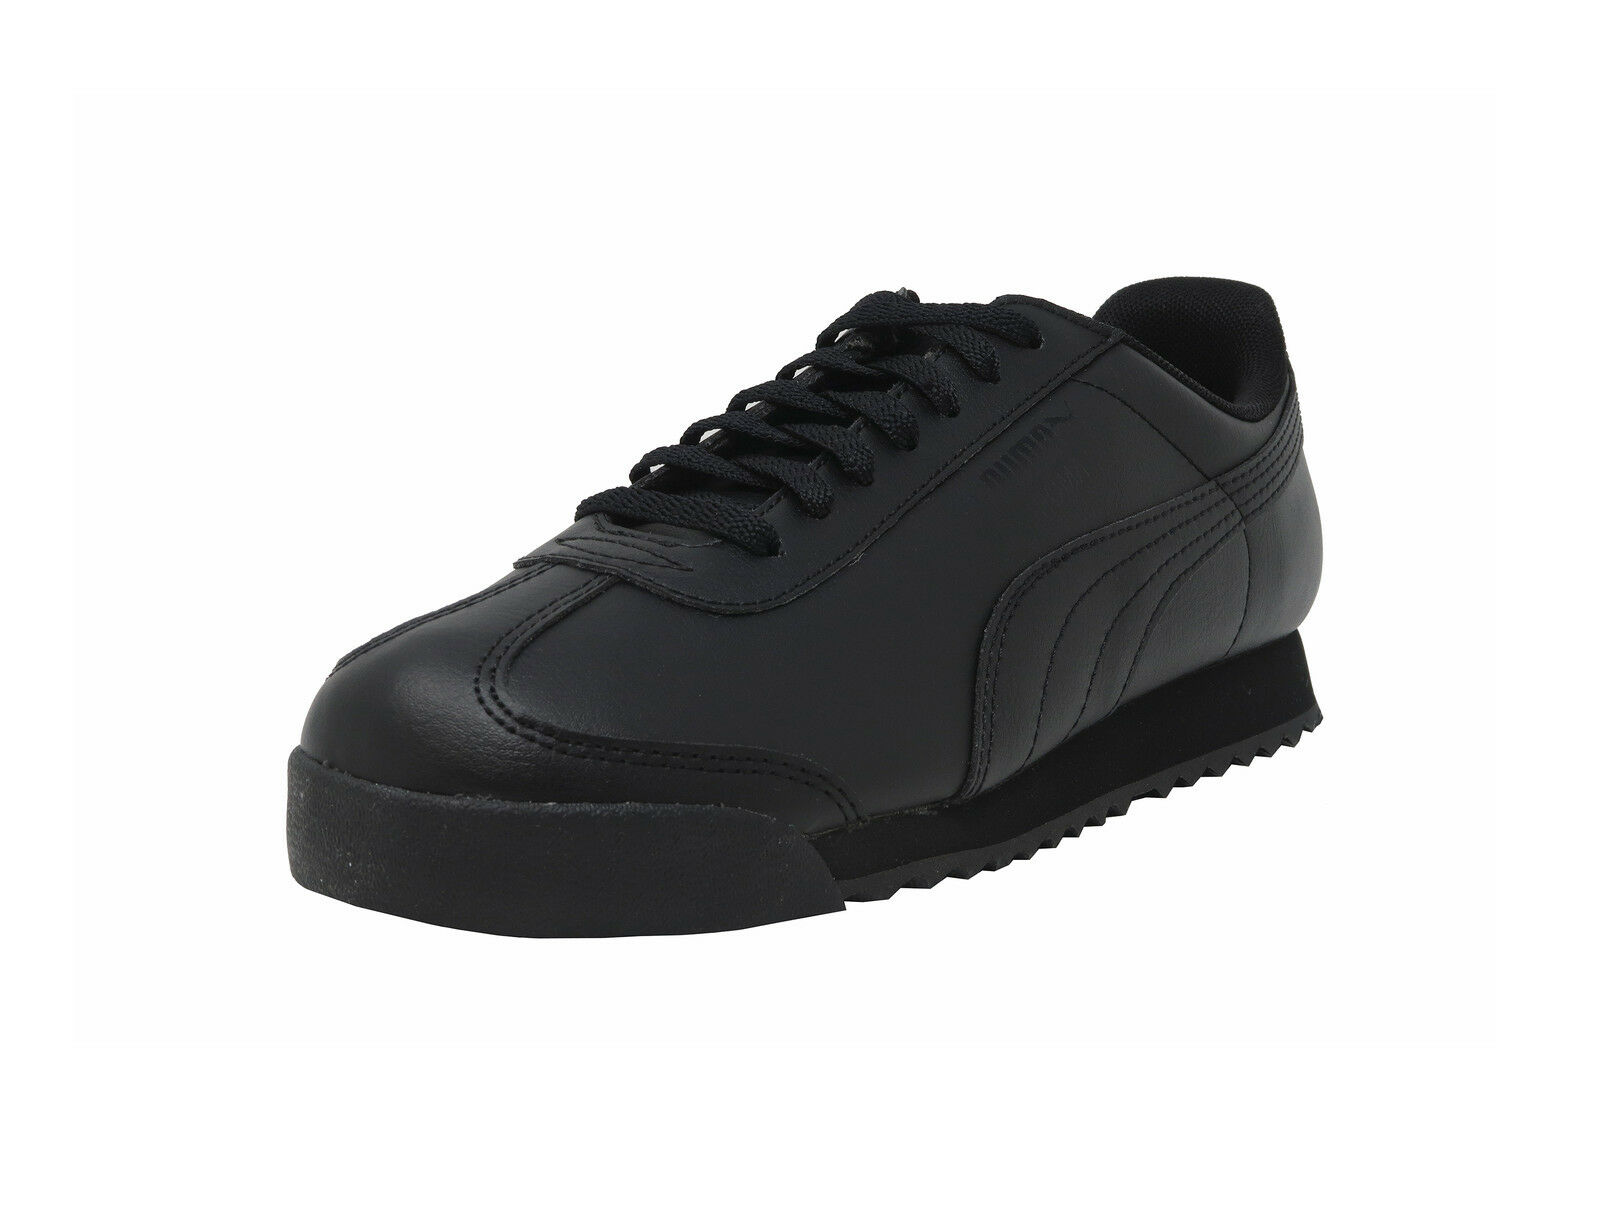 Puma Roma Basic Negro Zapatos Tenis Informales Para Para Para Sintético Negro 354259-12  envio rapido a ti